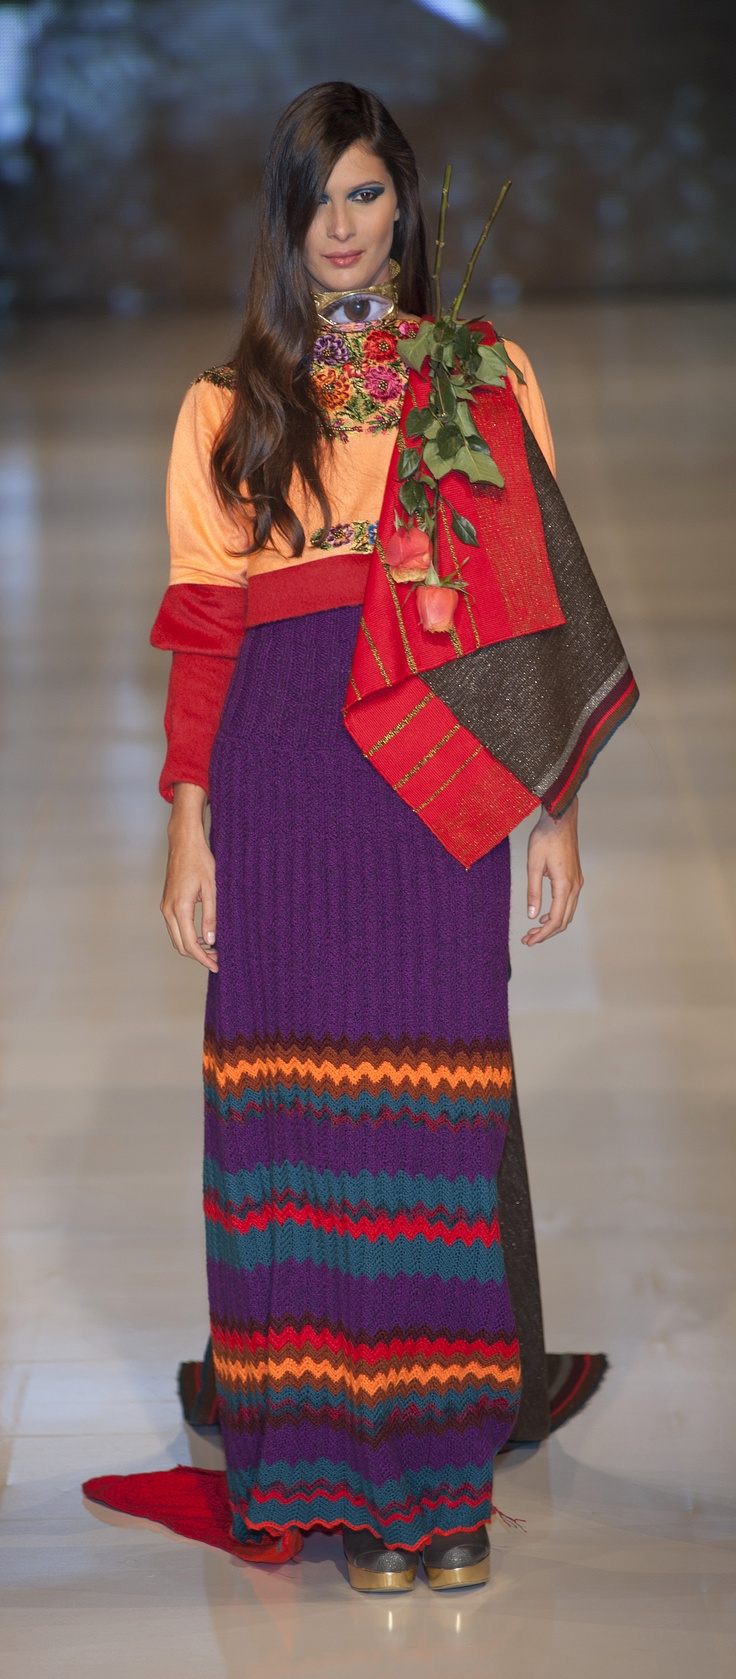 Horus Collection #Runway - Designer: Adriana Santacruz #fashion @Ad_Santacruz